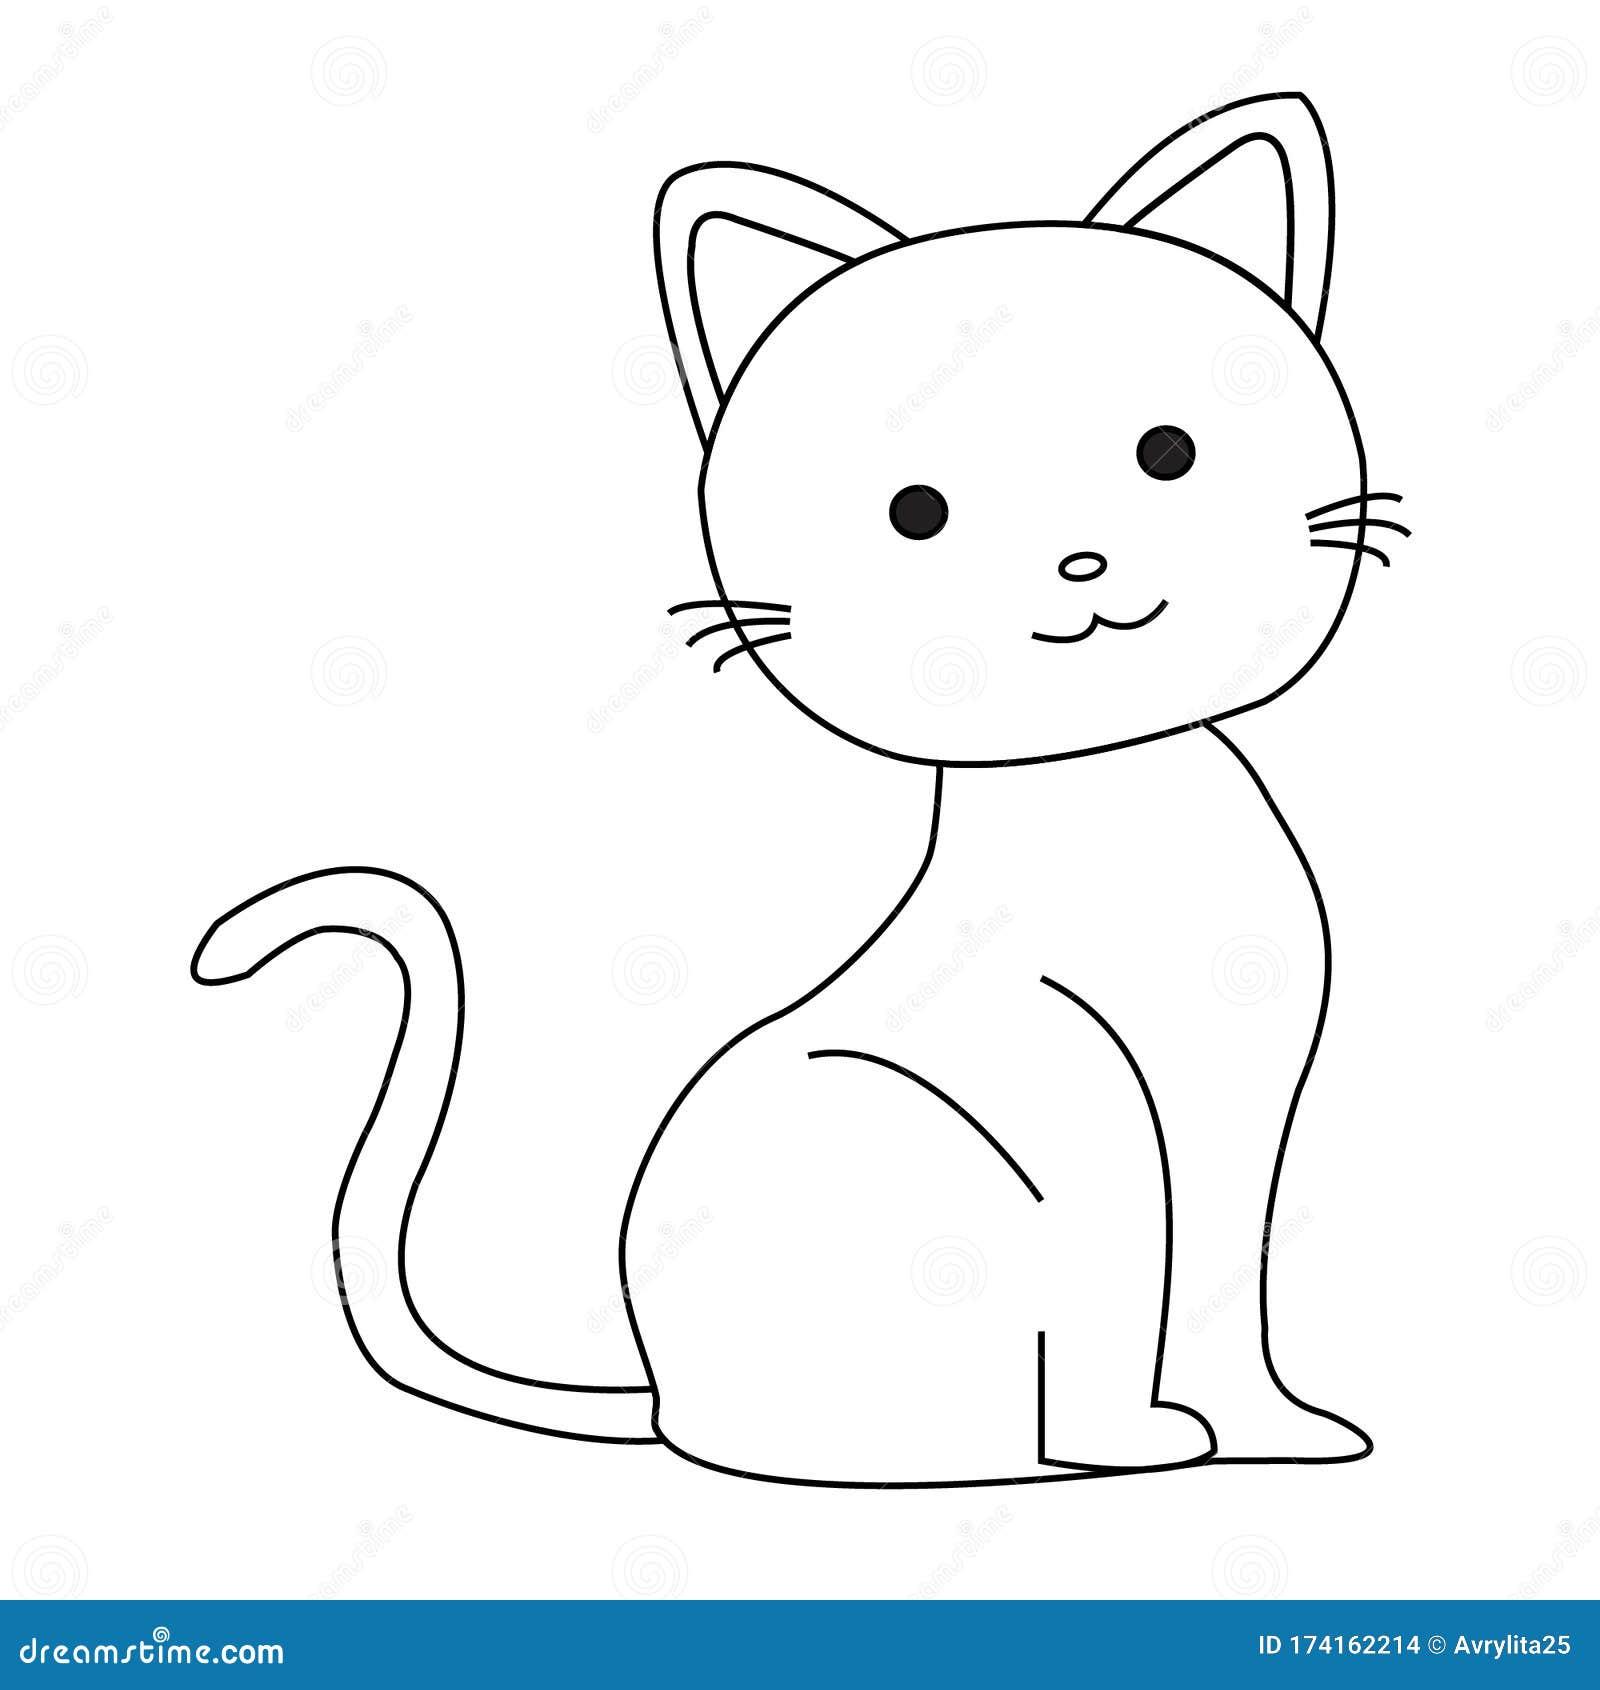 Cute Cartoon Cat Outline Vector Stock Vector Illustration Of Kitten Contour 174162214